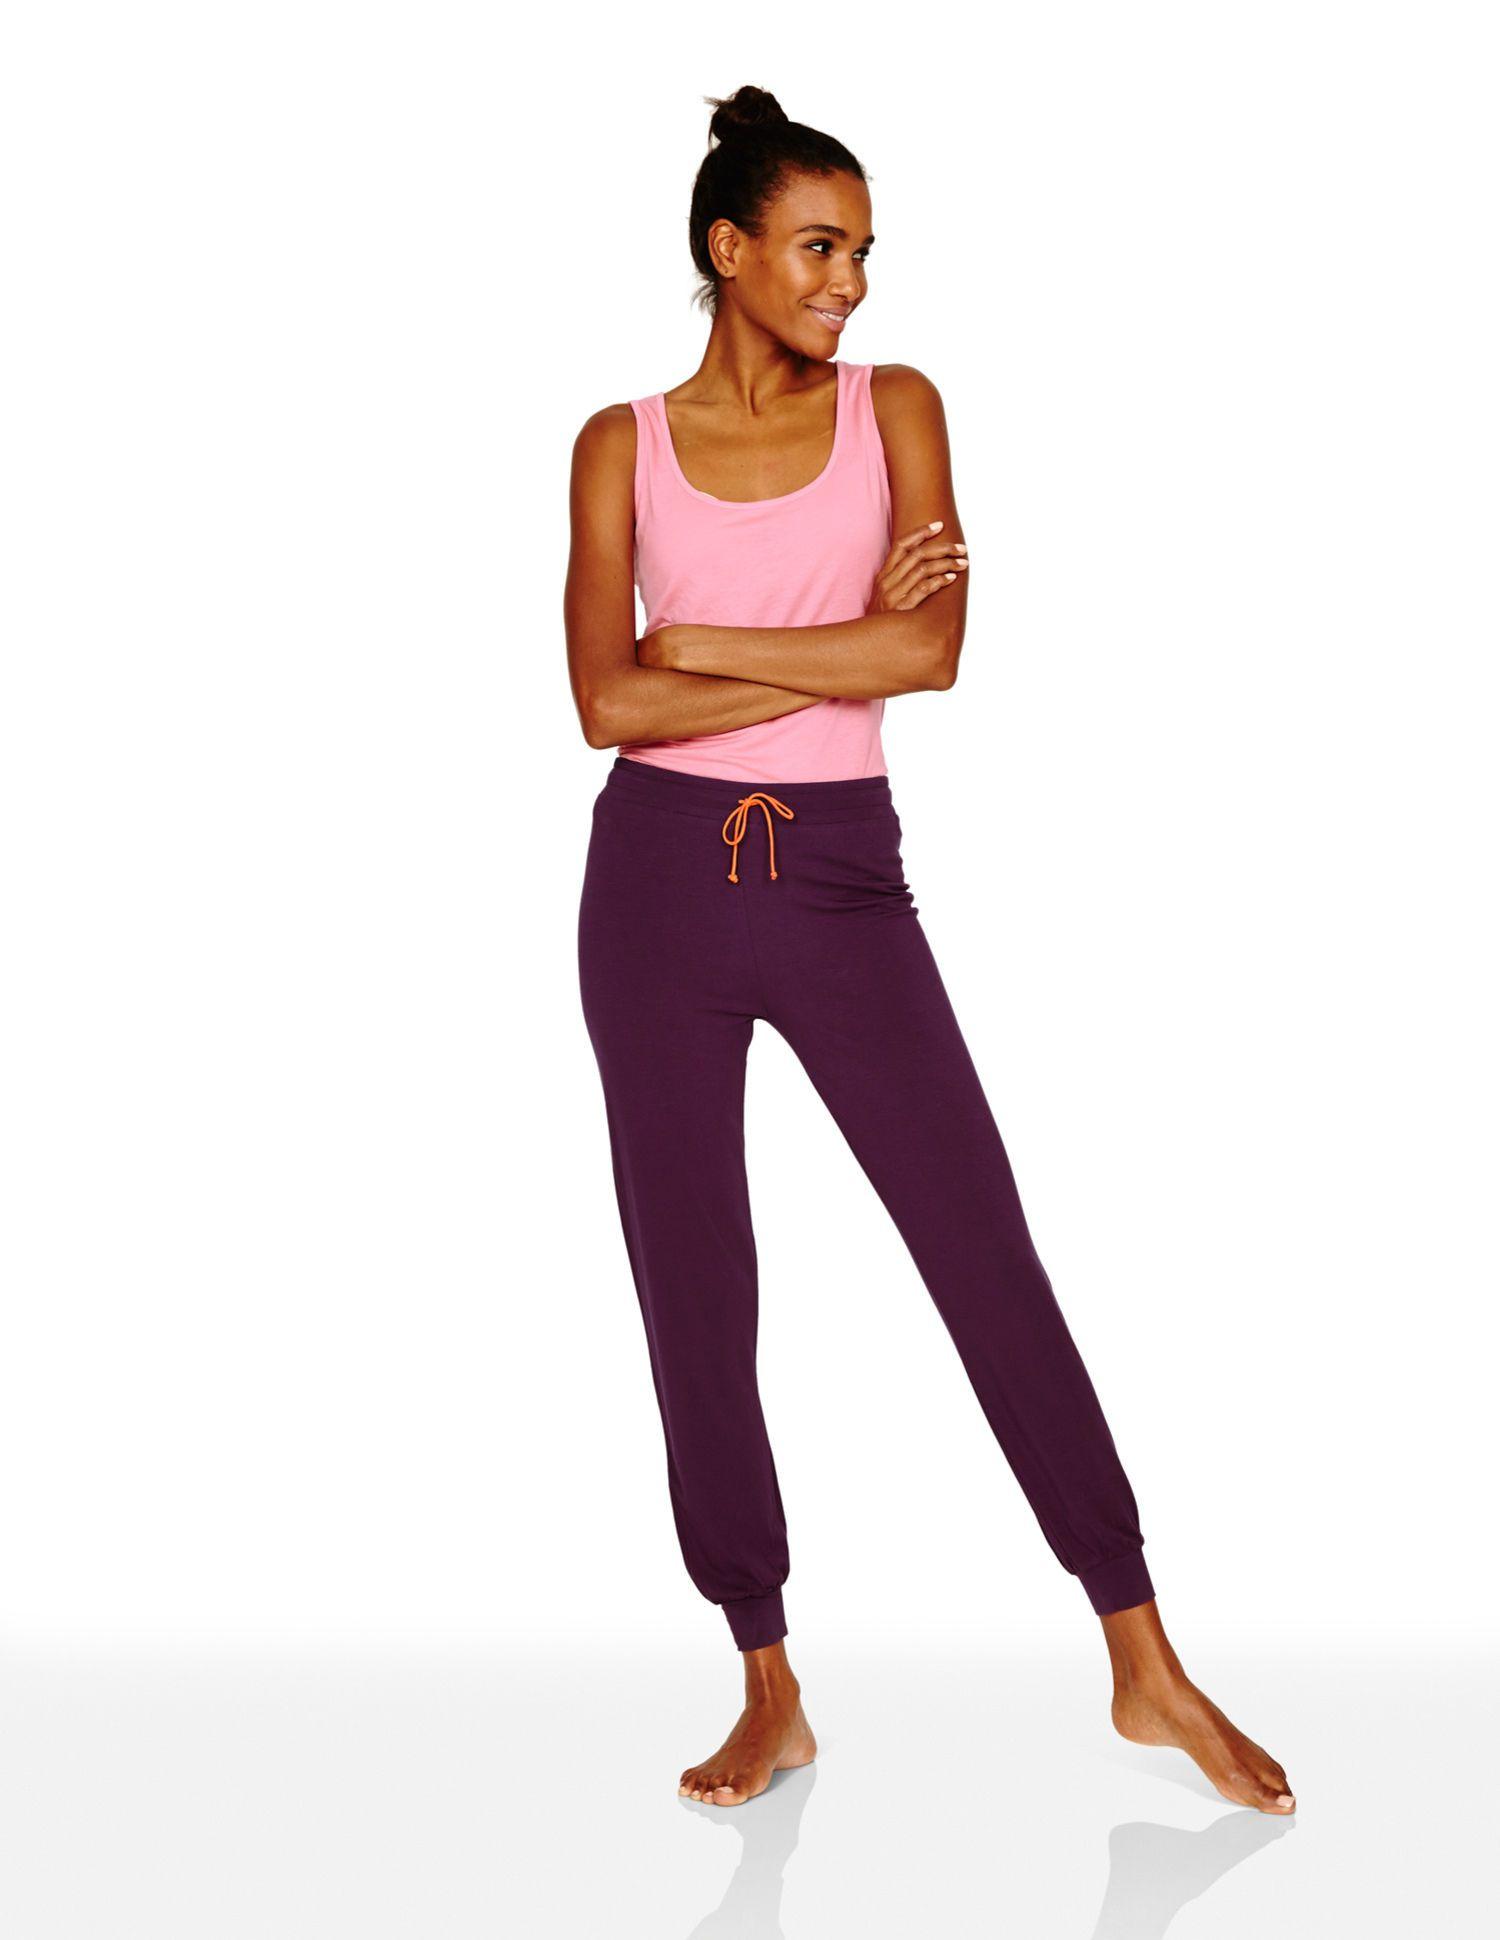 Yoga Loose Trousers Bm012 Yoga At Boden Healthy Living Pinterest